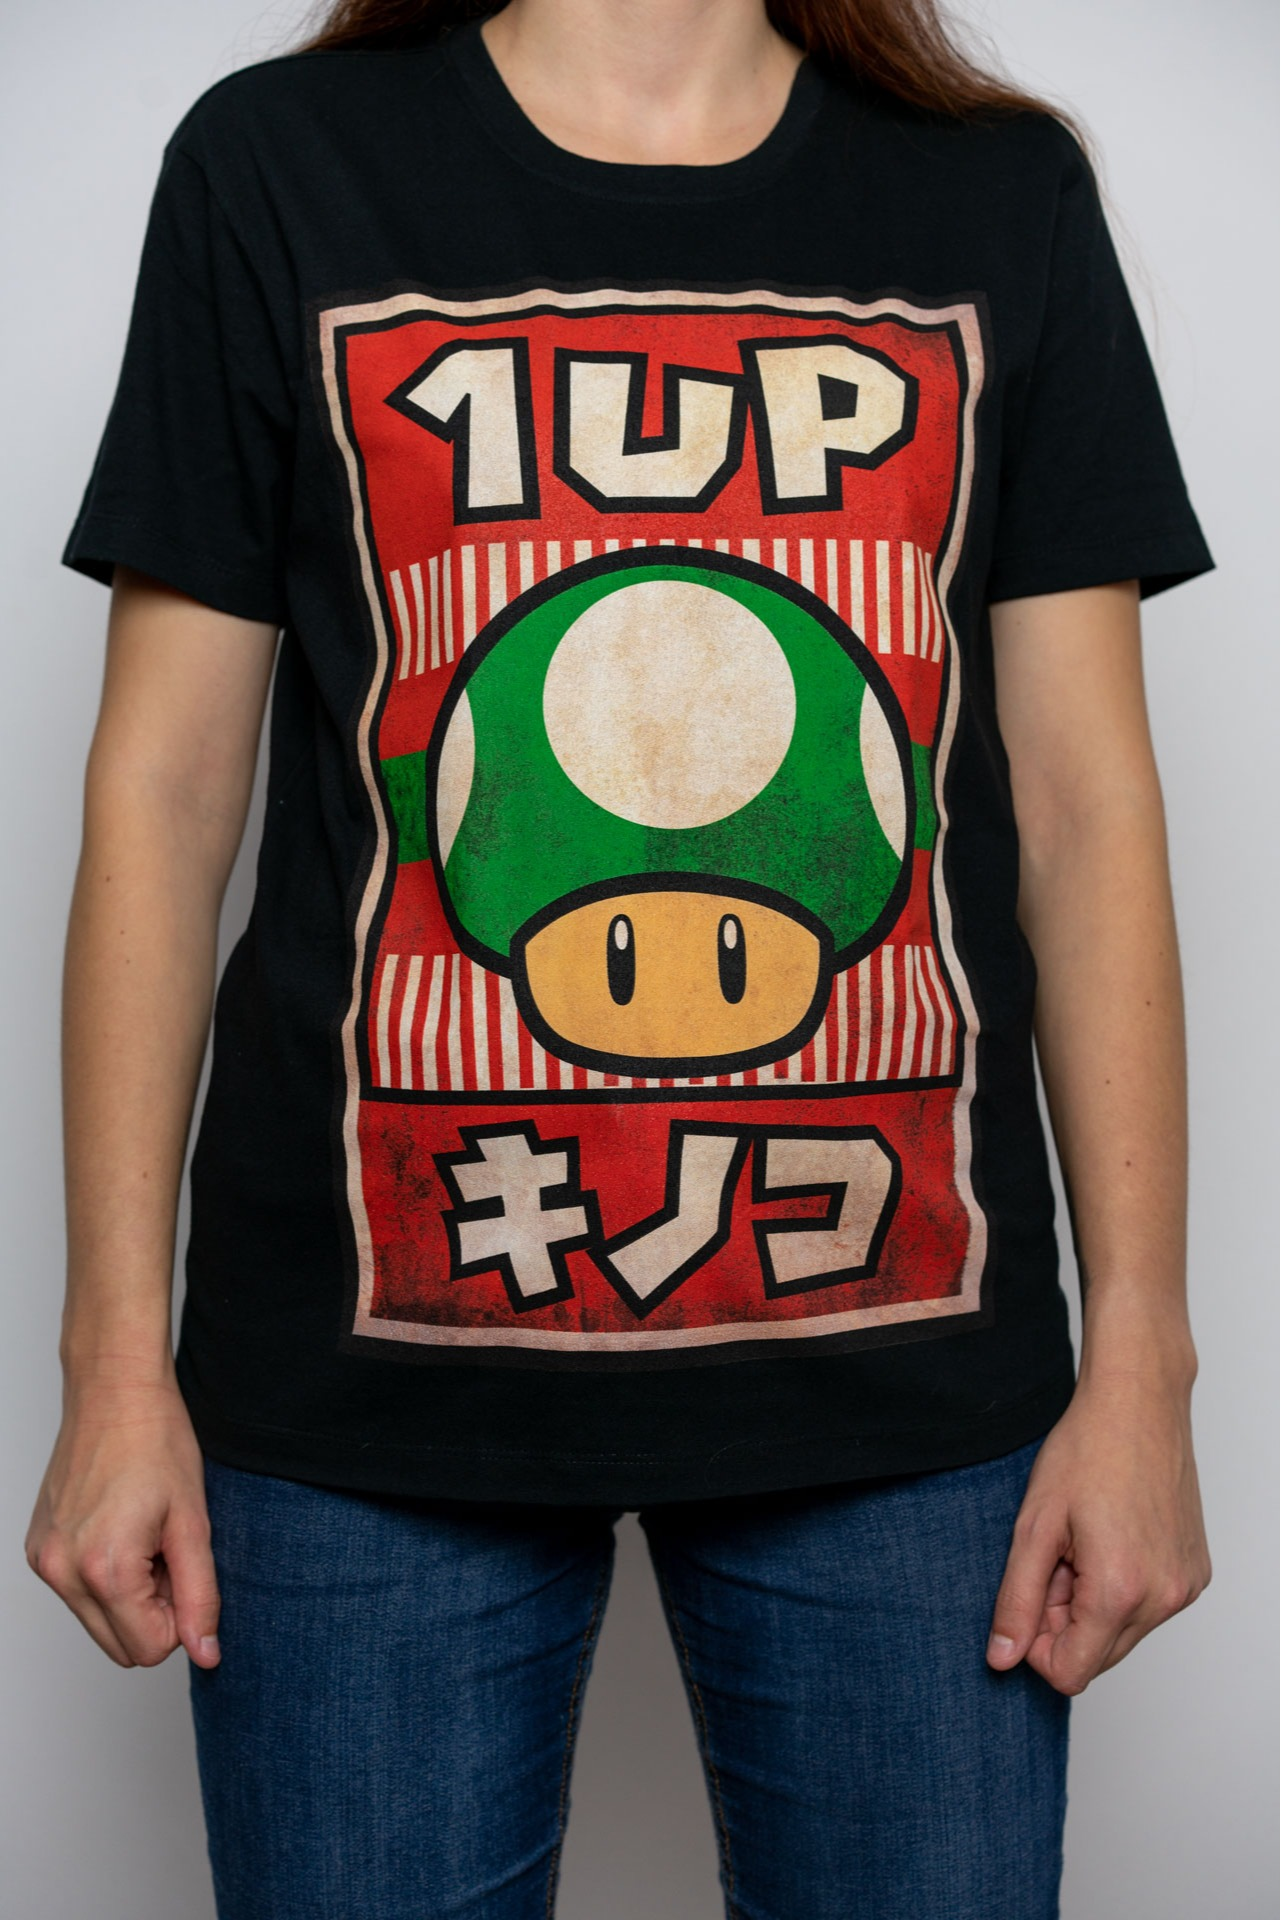 Tričko Nintendo - Propaganda Poster 1-UP Mushroom (velikost L) (PC)